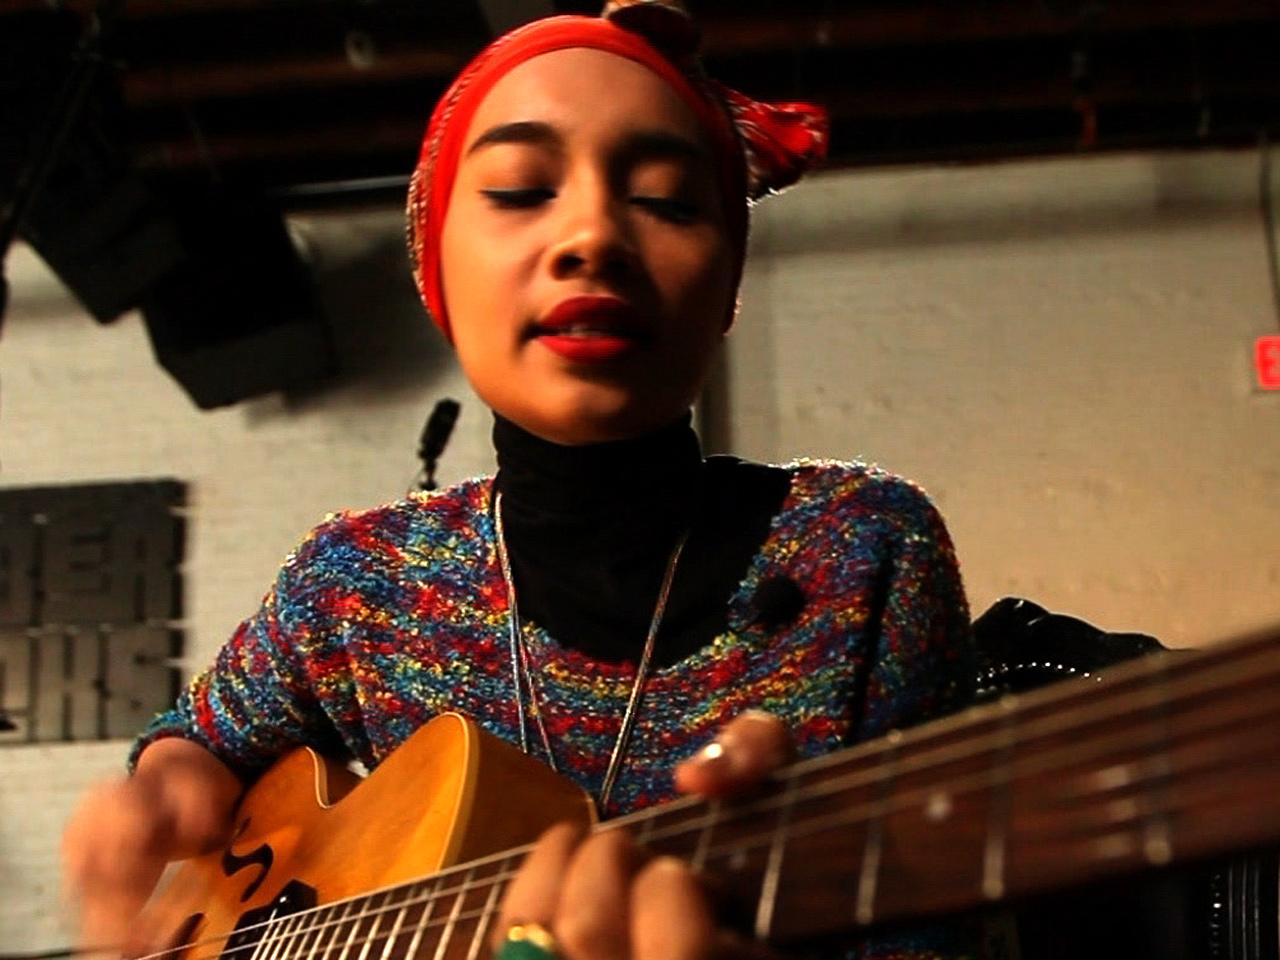 Malaysian Muslim singer Yuna making mark in U.S. - CBS News